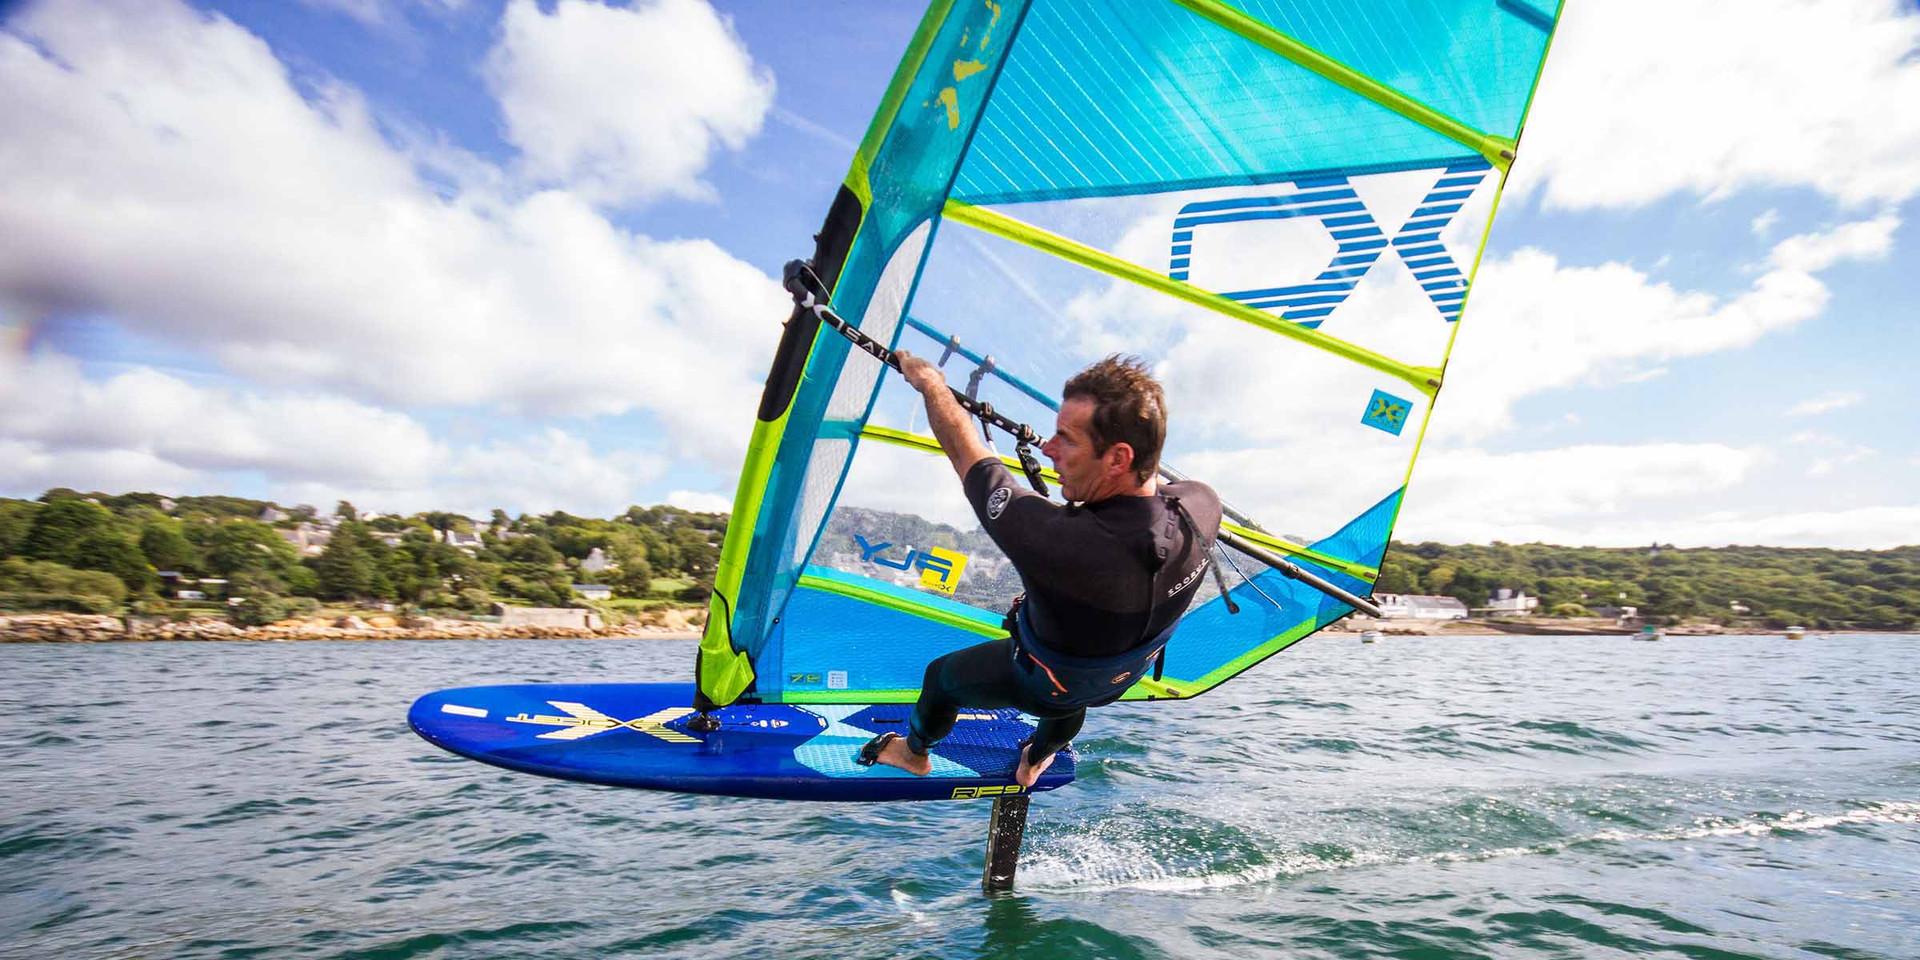 xo windsurf foiling sail